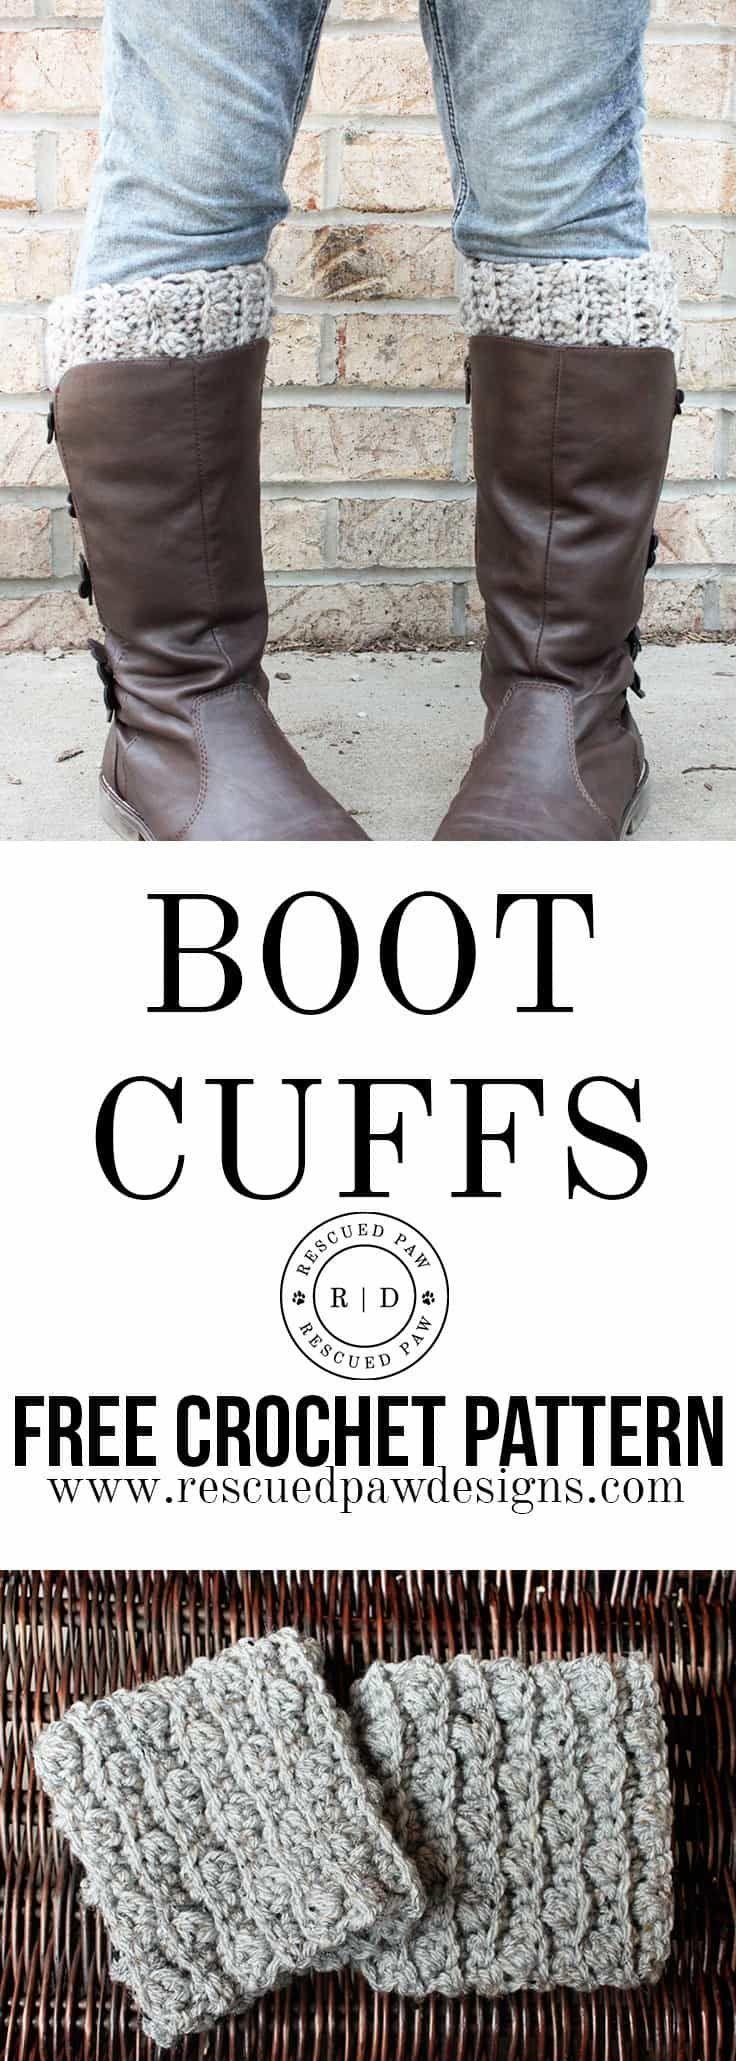 Mejores 49 imágenes de crochet shoes/socks en Pinterest | Zapatos de ...